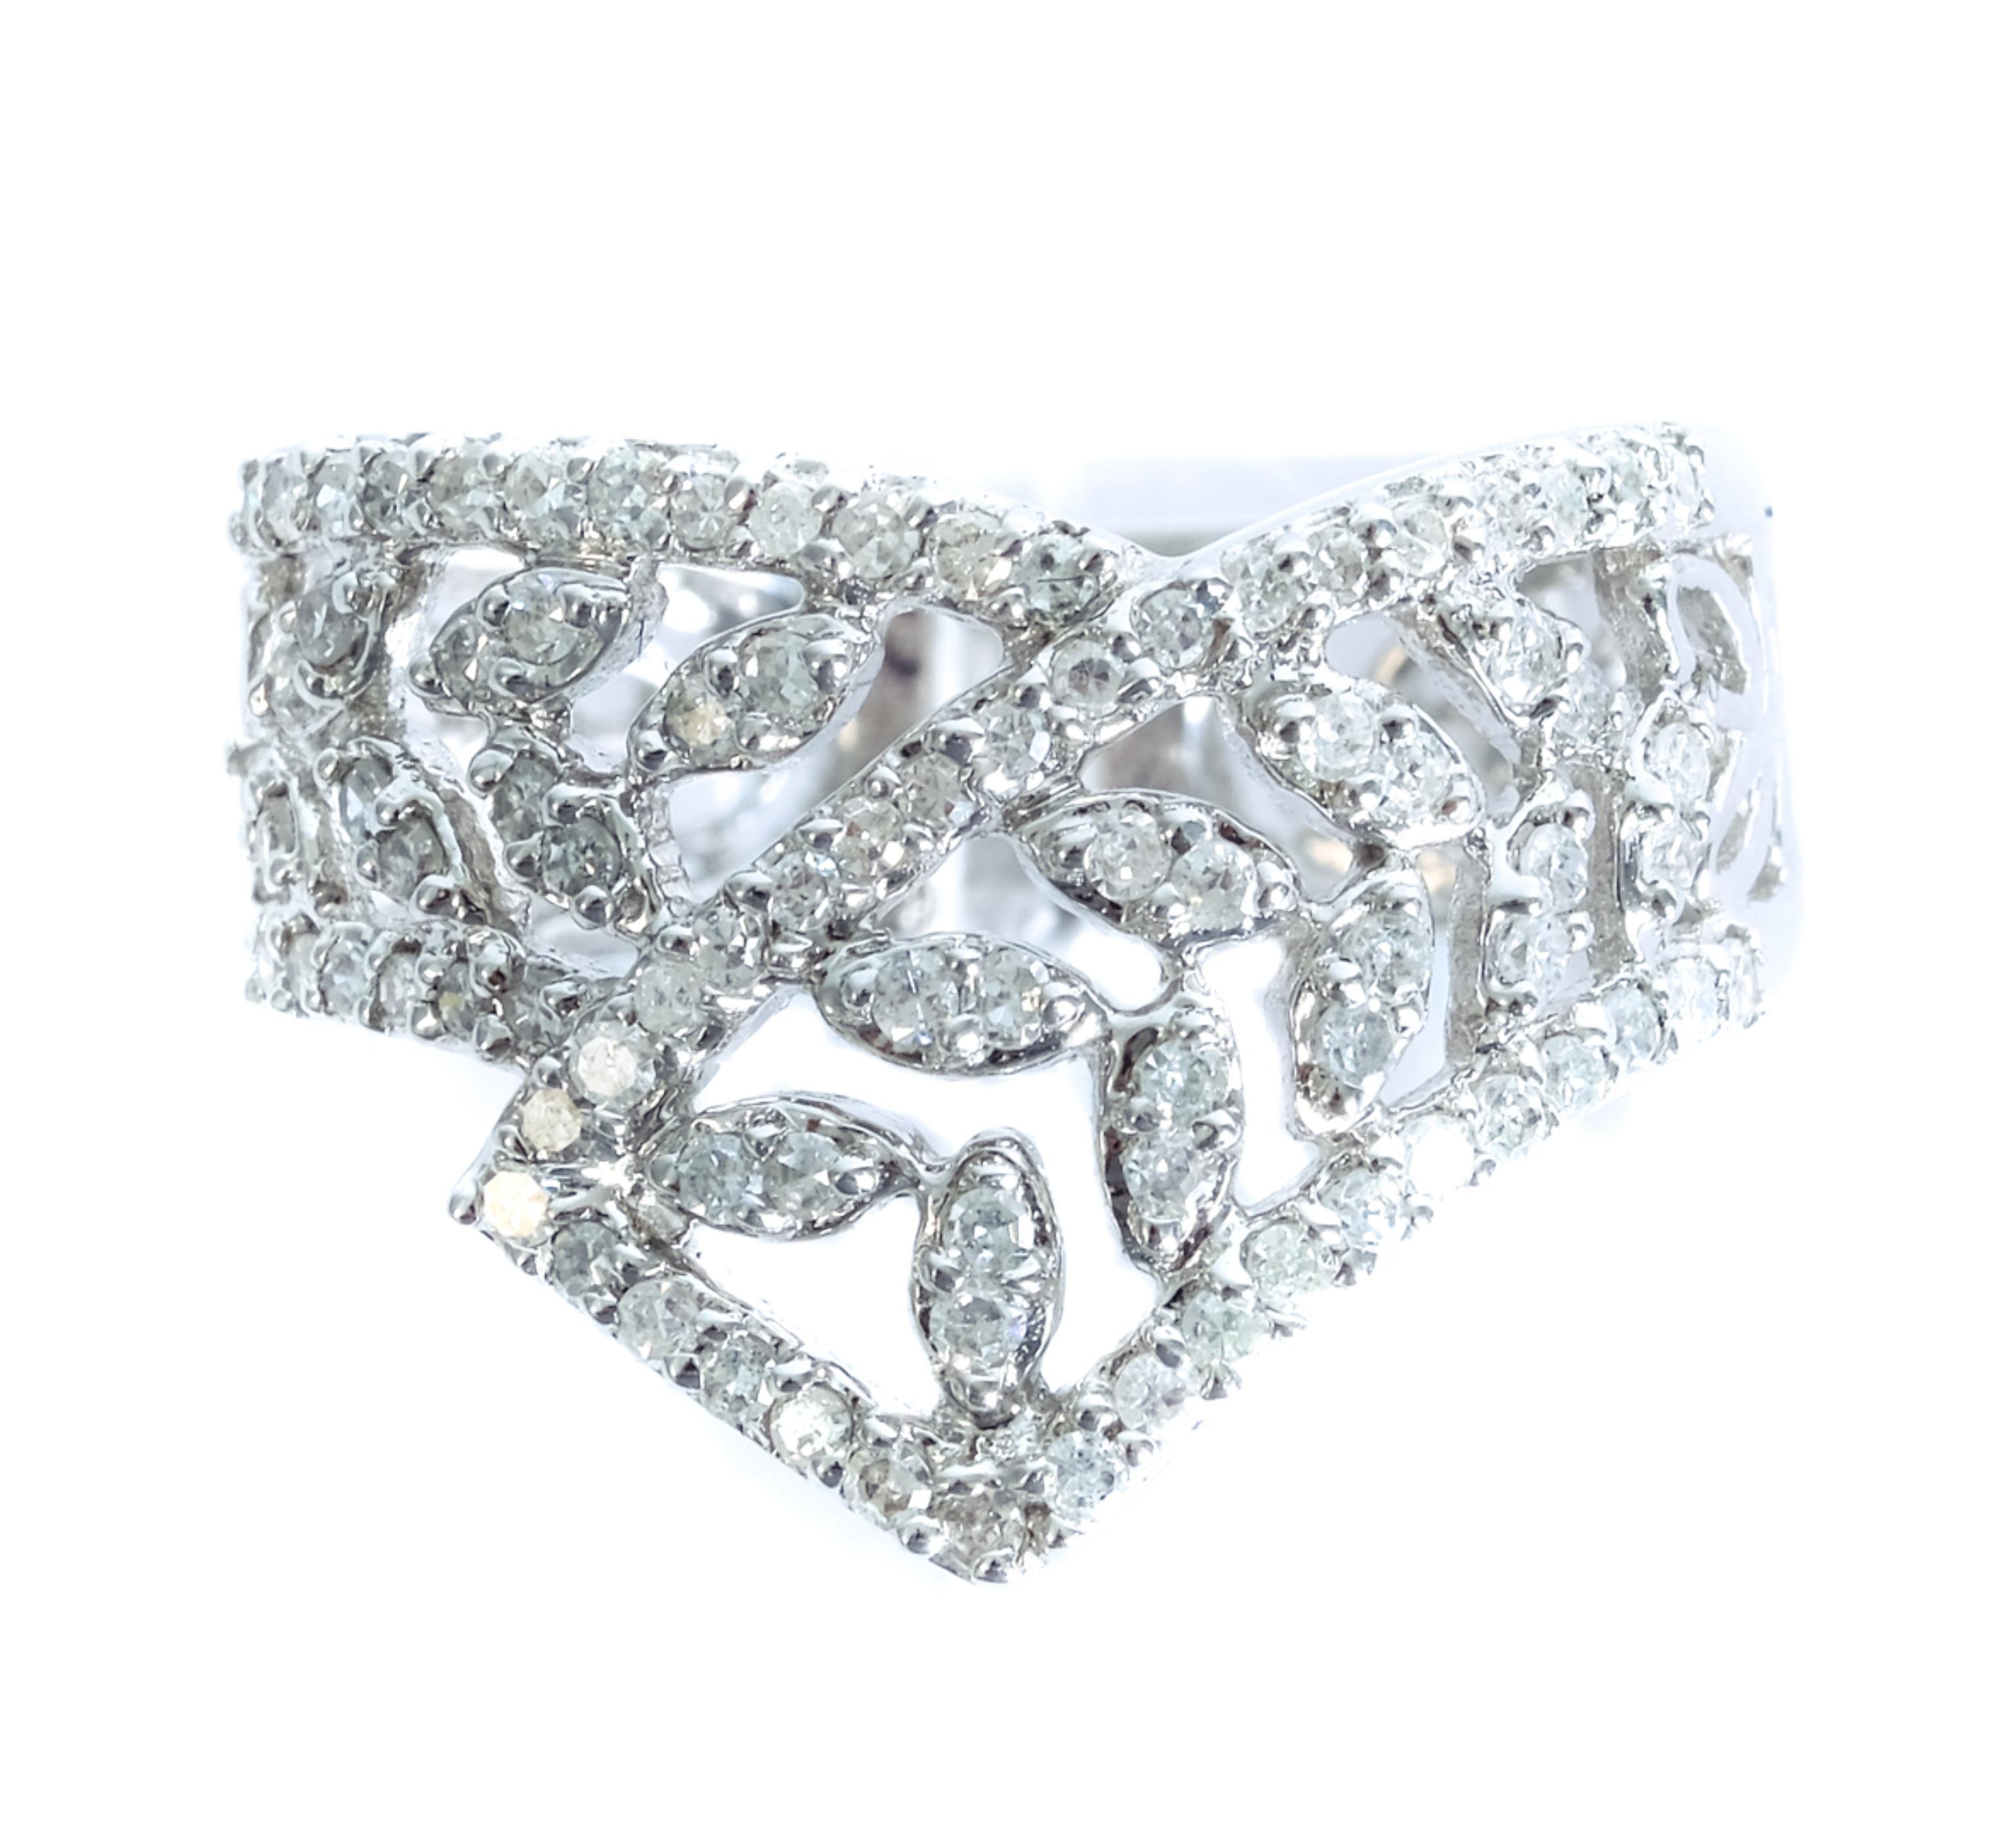 14k White Gold & Diamond Ring, Size 7